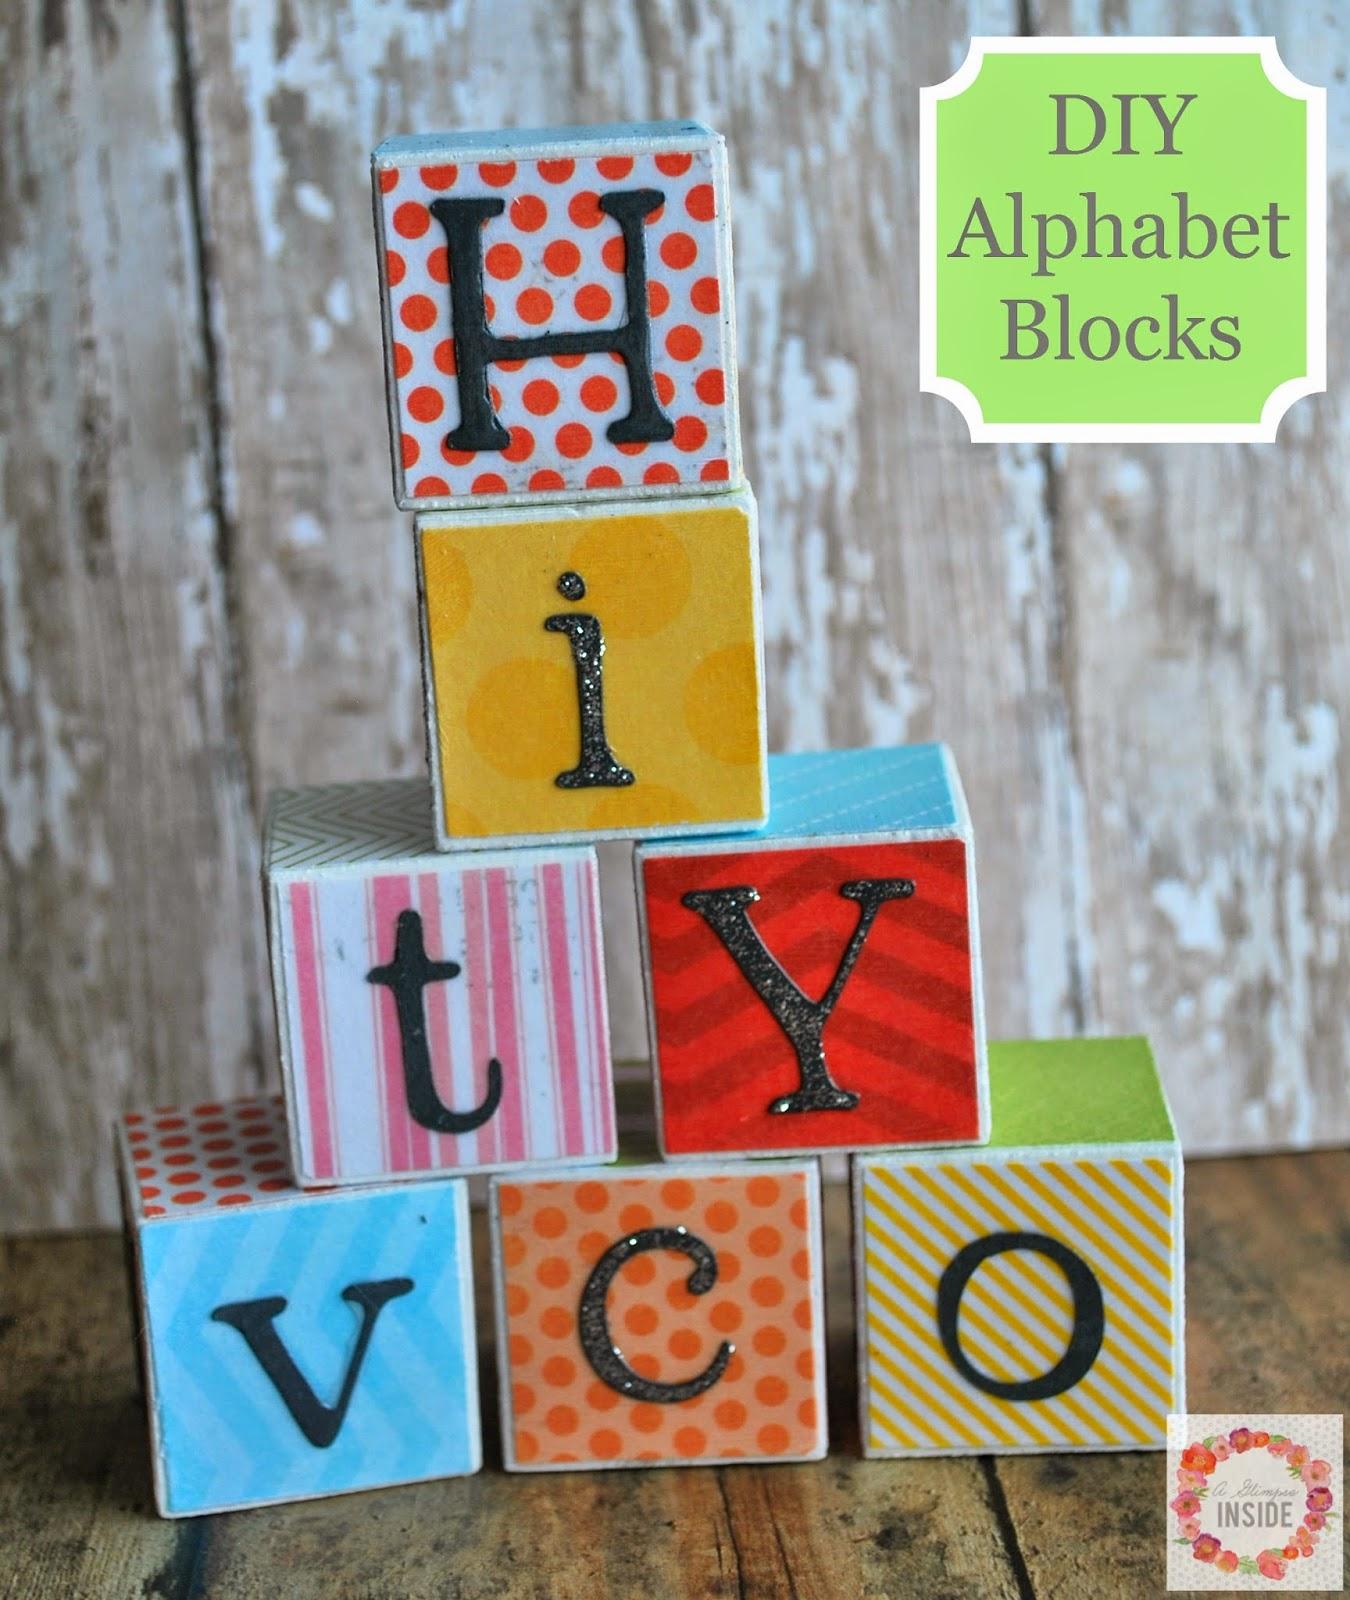 DIY Alphabet Blocks by A Glimpse Inside